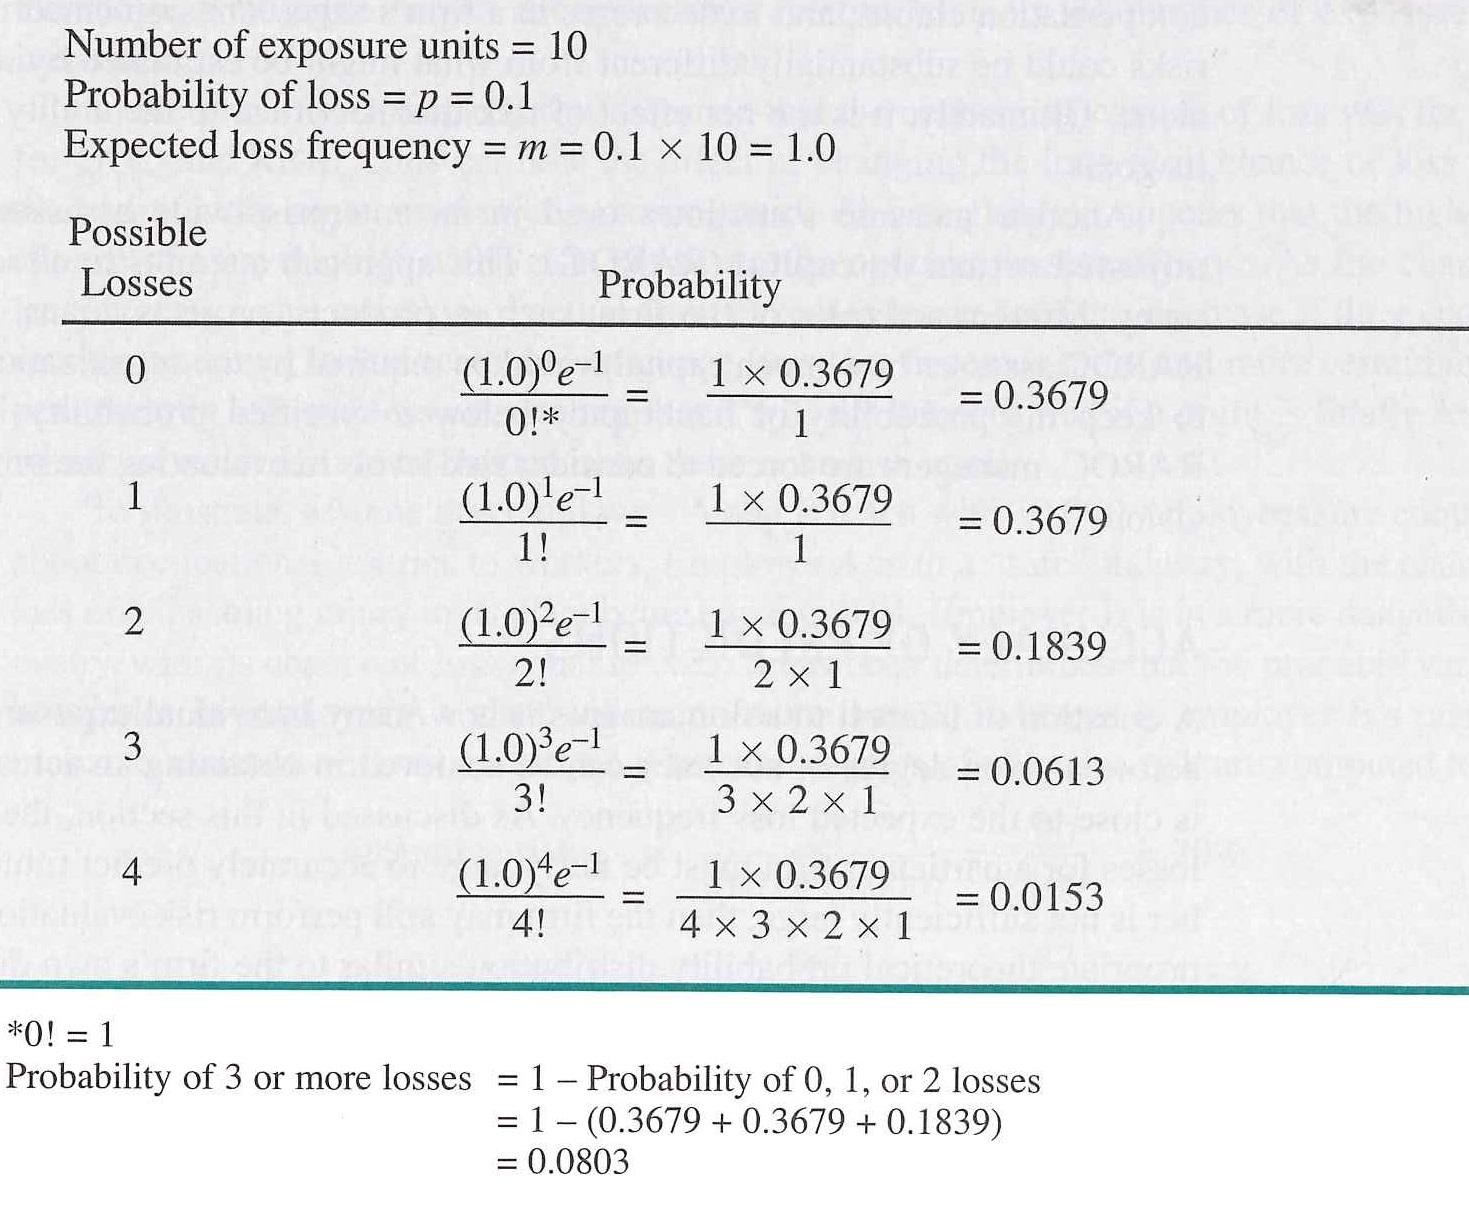 Chapt 2 Table 2-2.jpg